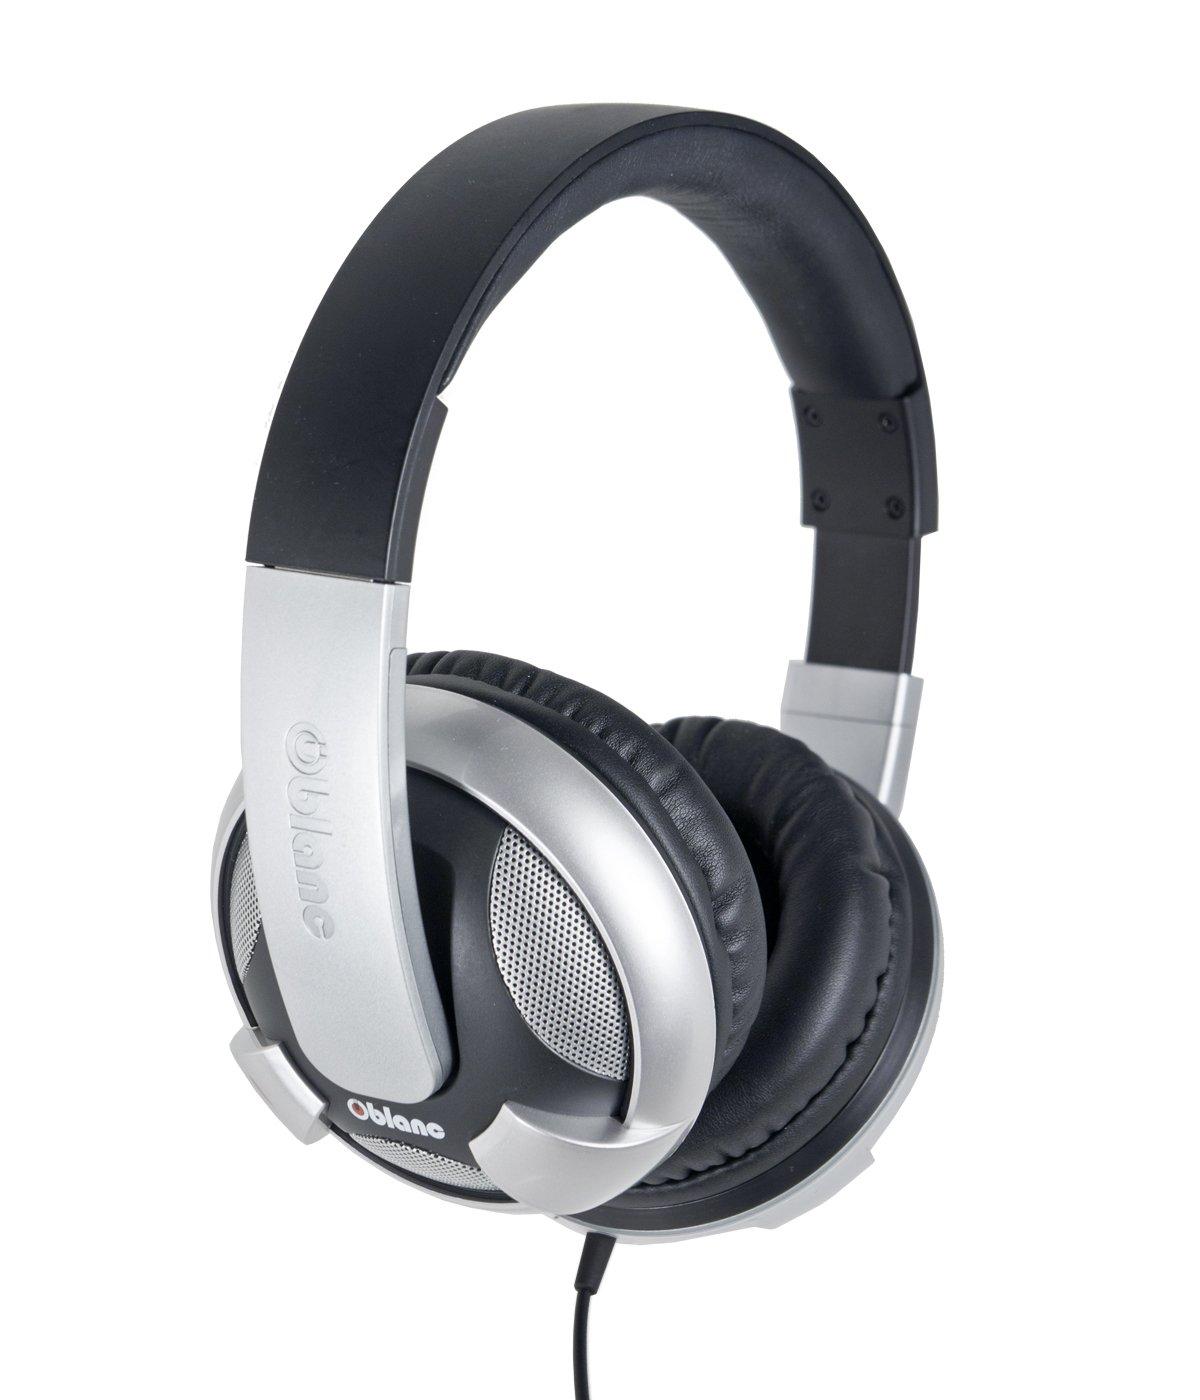 Syba Headphone Amplifier Microphone OG AUD63053